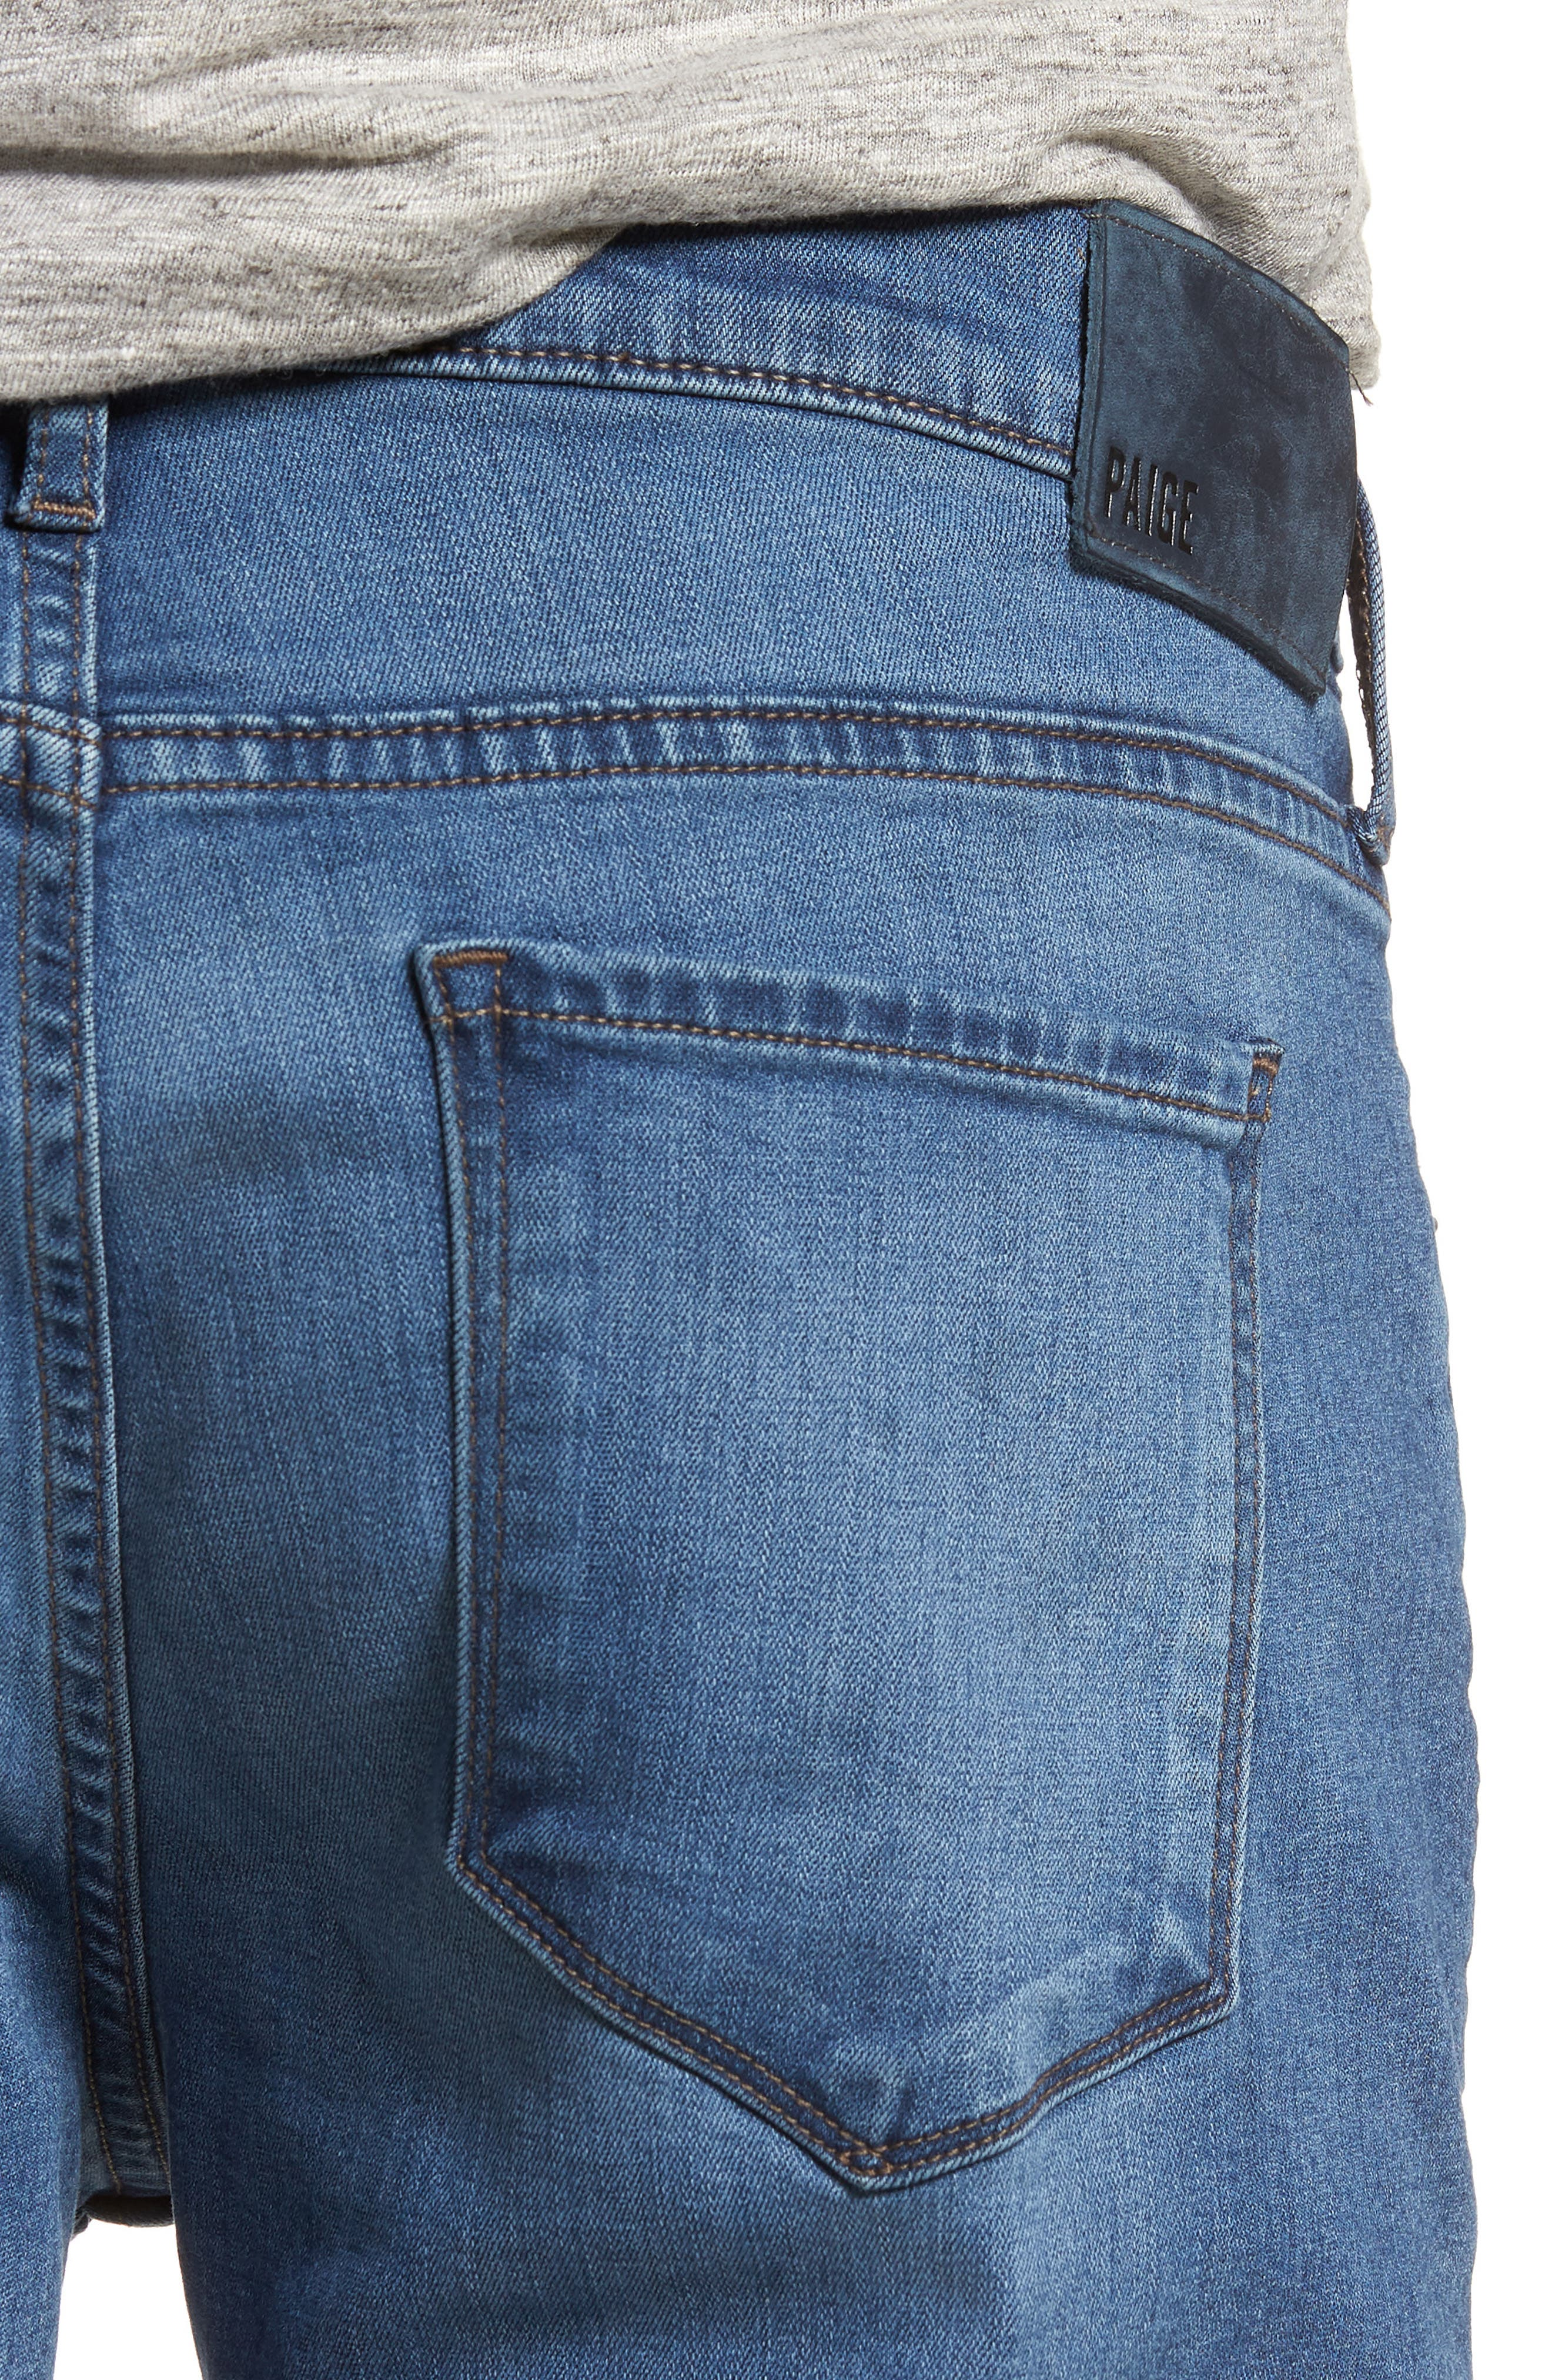 Federal Slim Straight Leg Jeans,                             Alternate thumbnail 4, color,                             Ellice